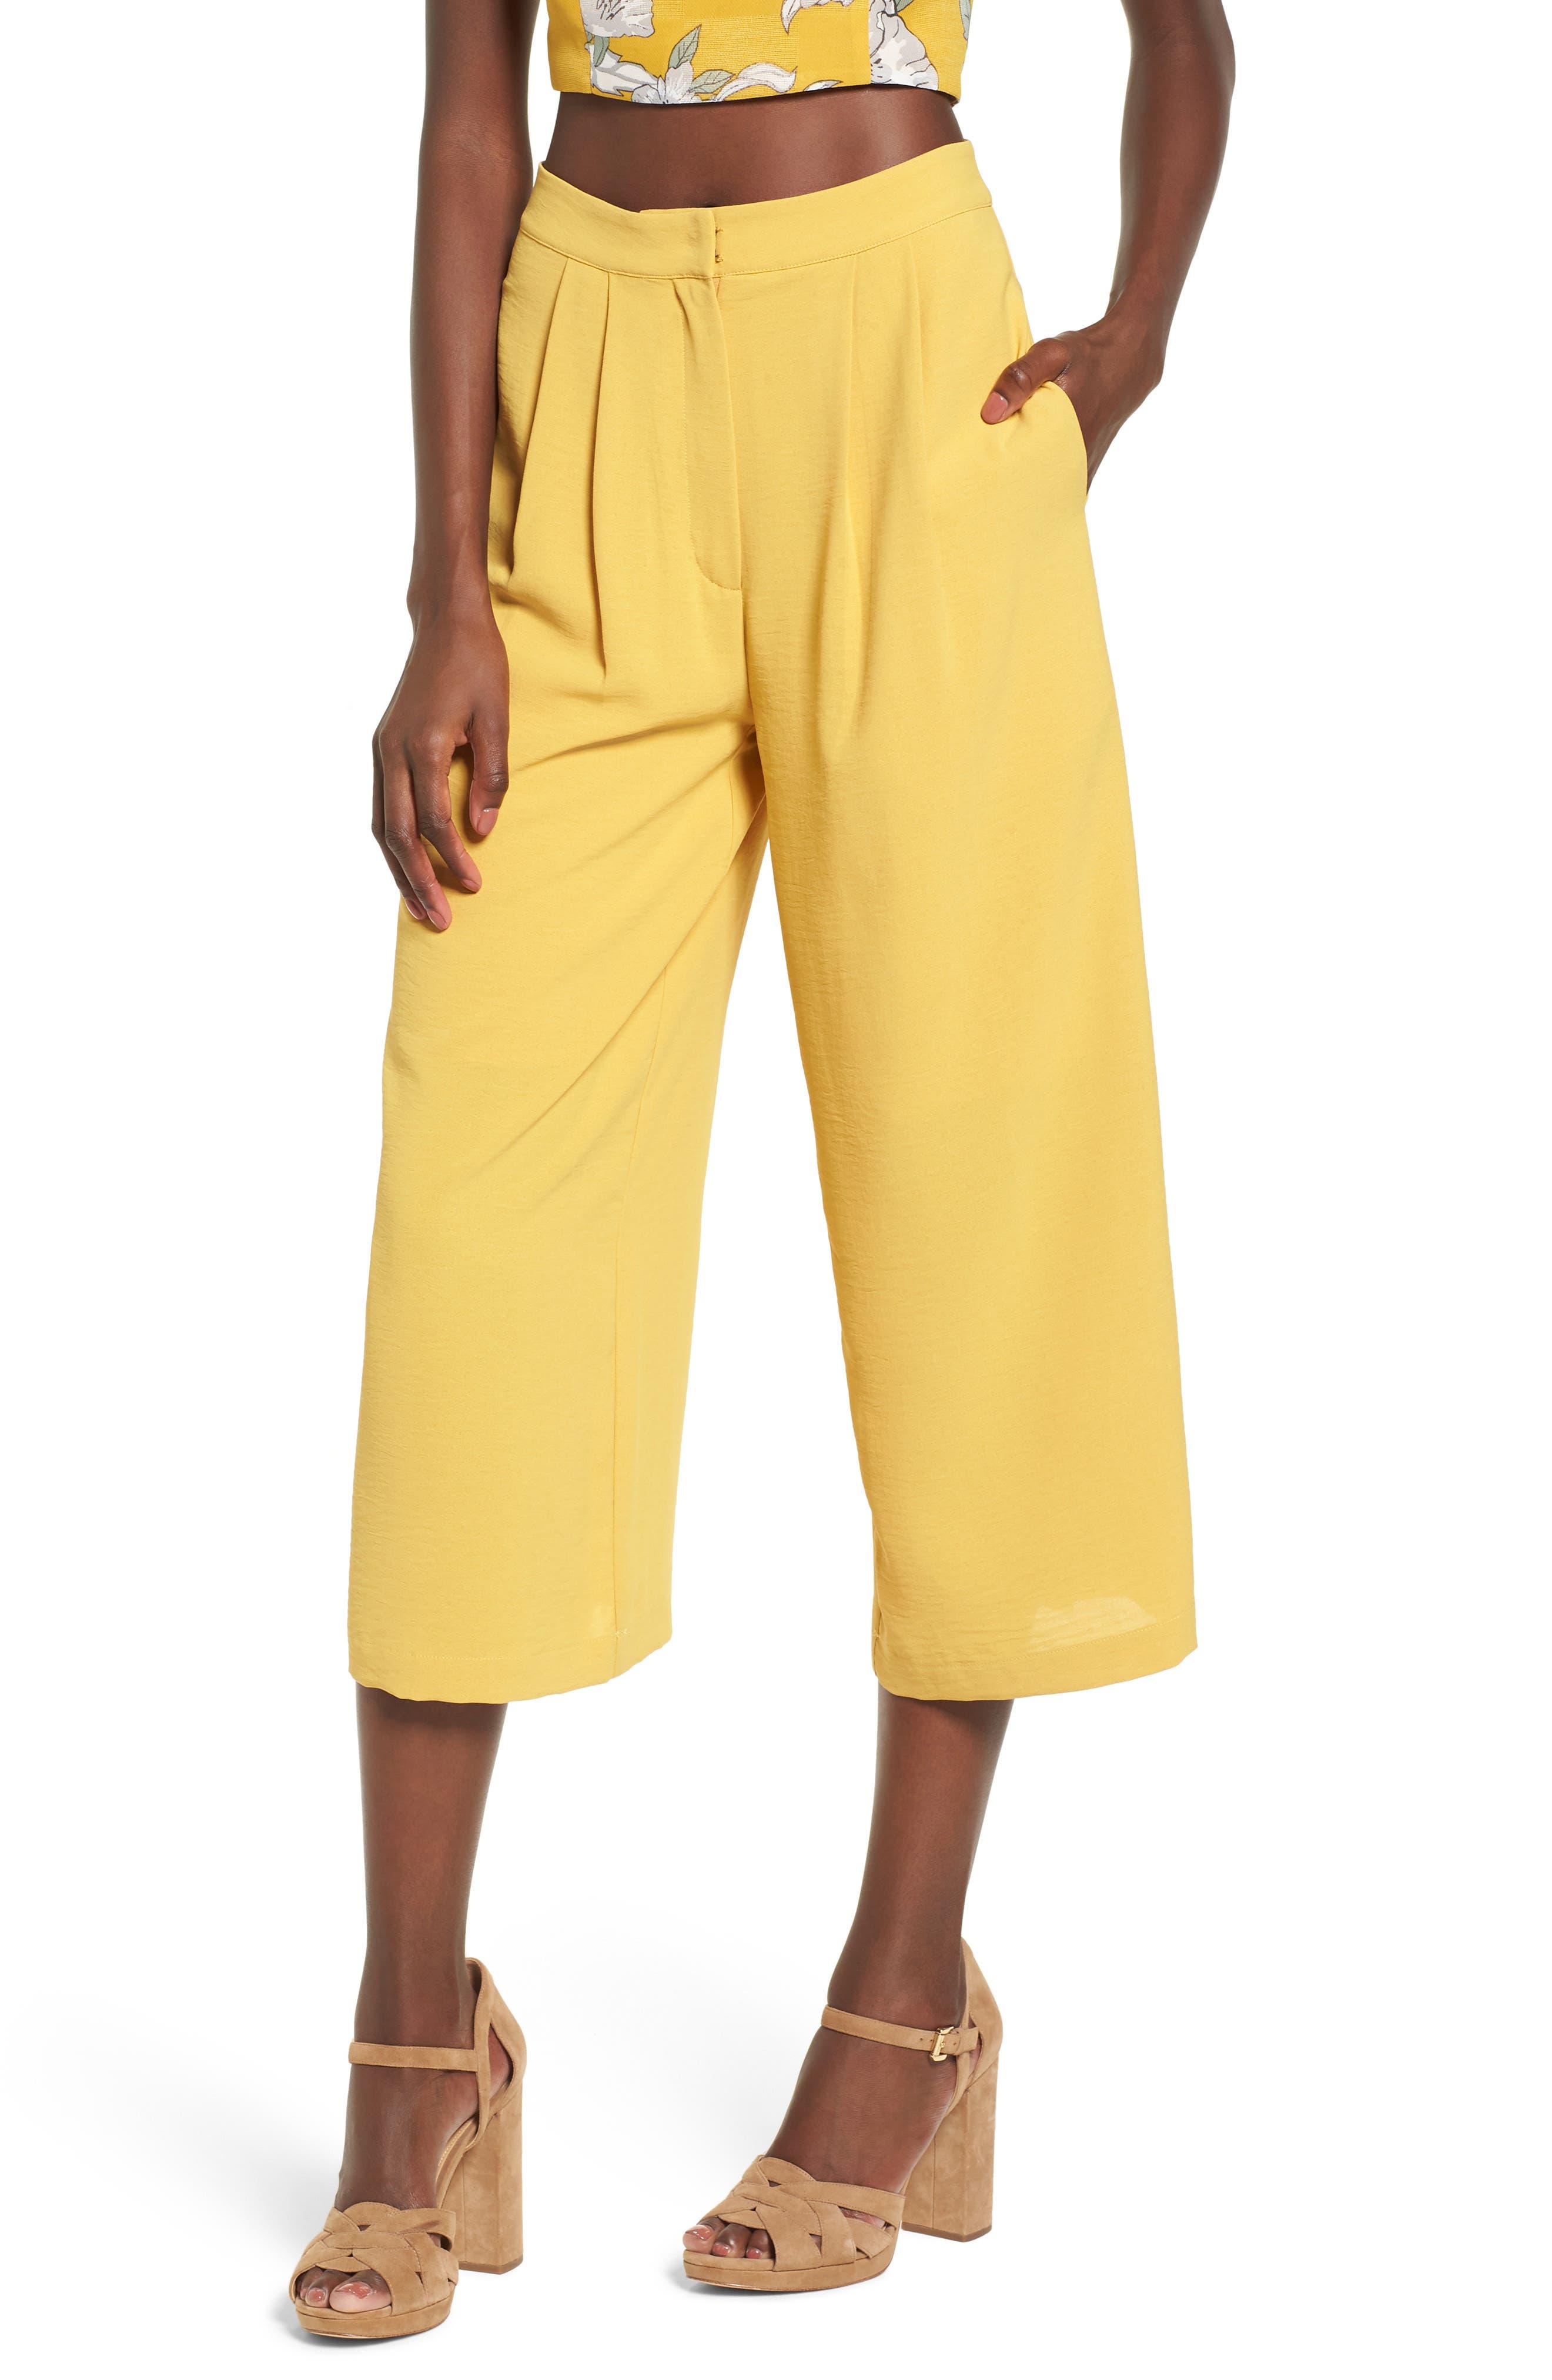 Chriselle x J.O.A. Pleat High Waist Crop Wide Leg Pants,                             Main thumbnail 1, color,                             Roman Gold